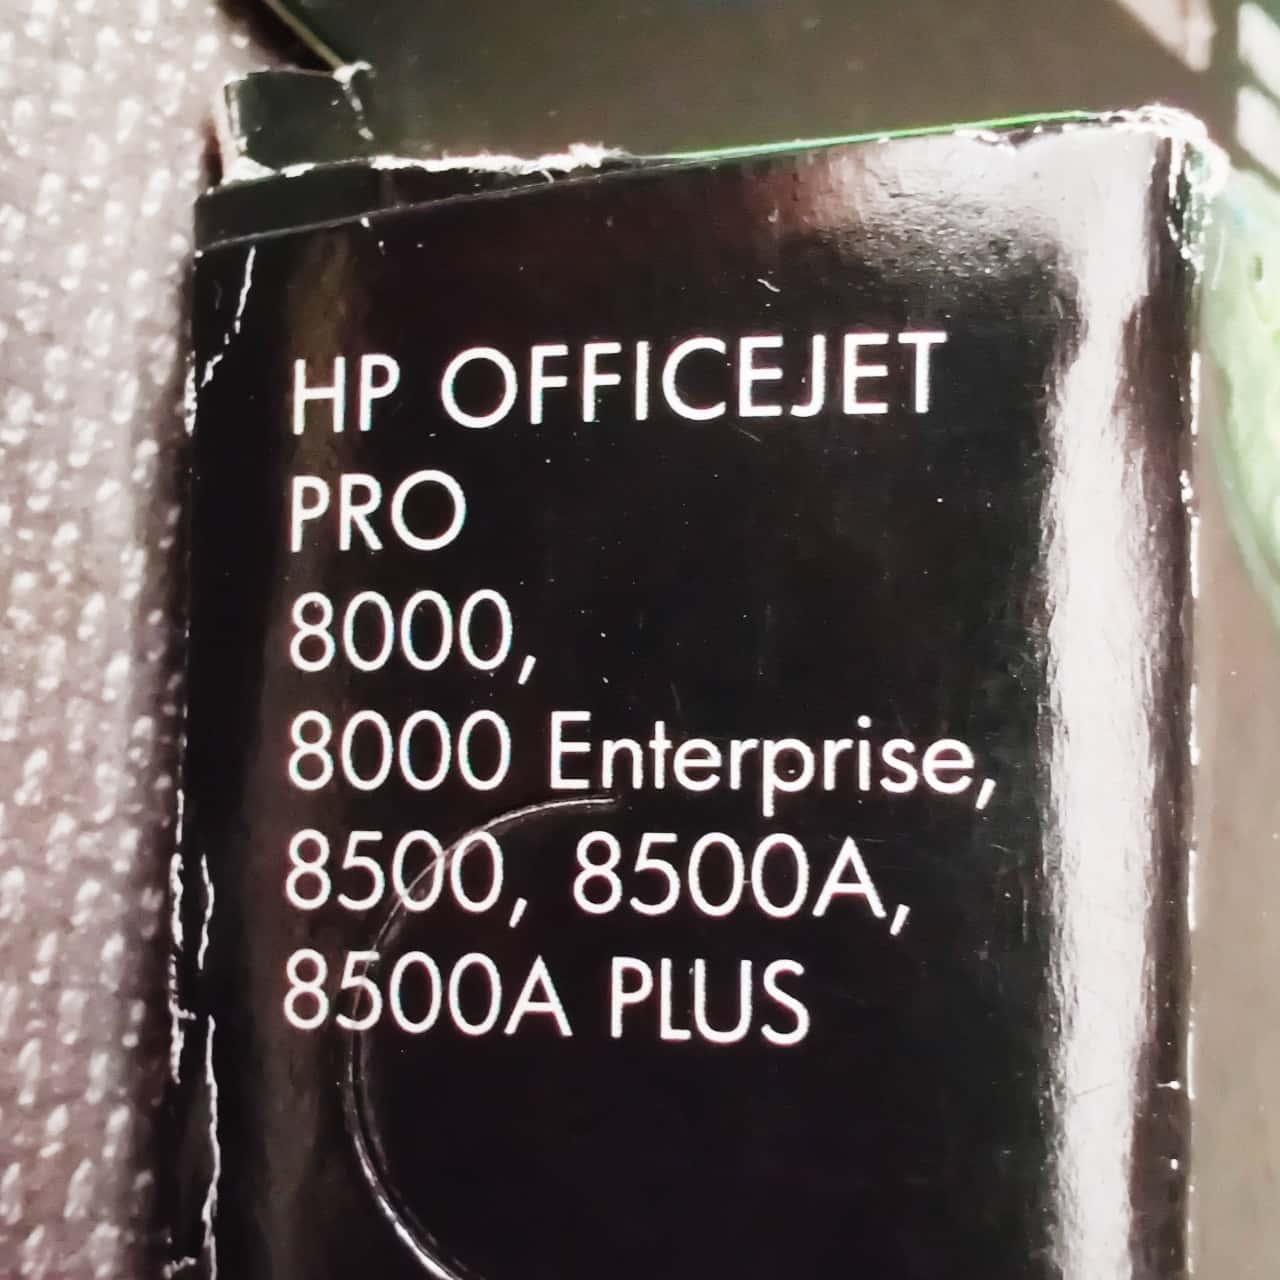 HP 940 XL Magenta Inkjet Cartridge for HP Officejet printers as per photo list